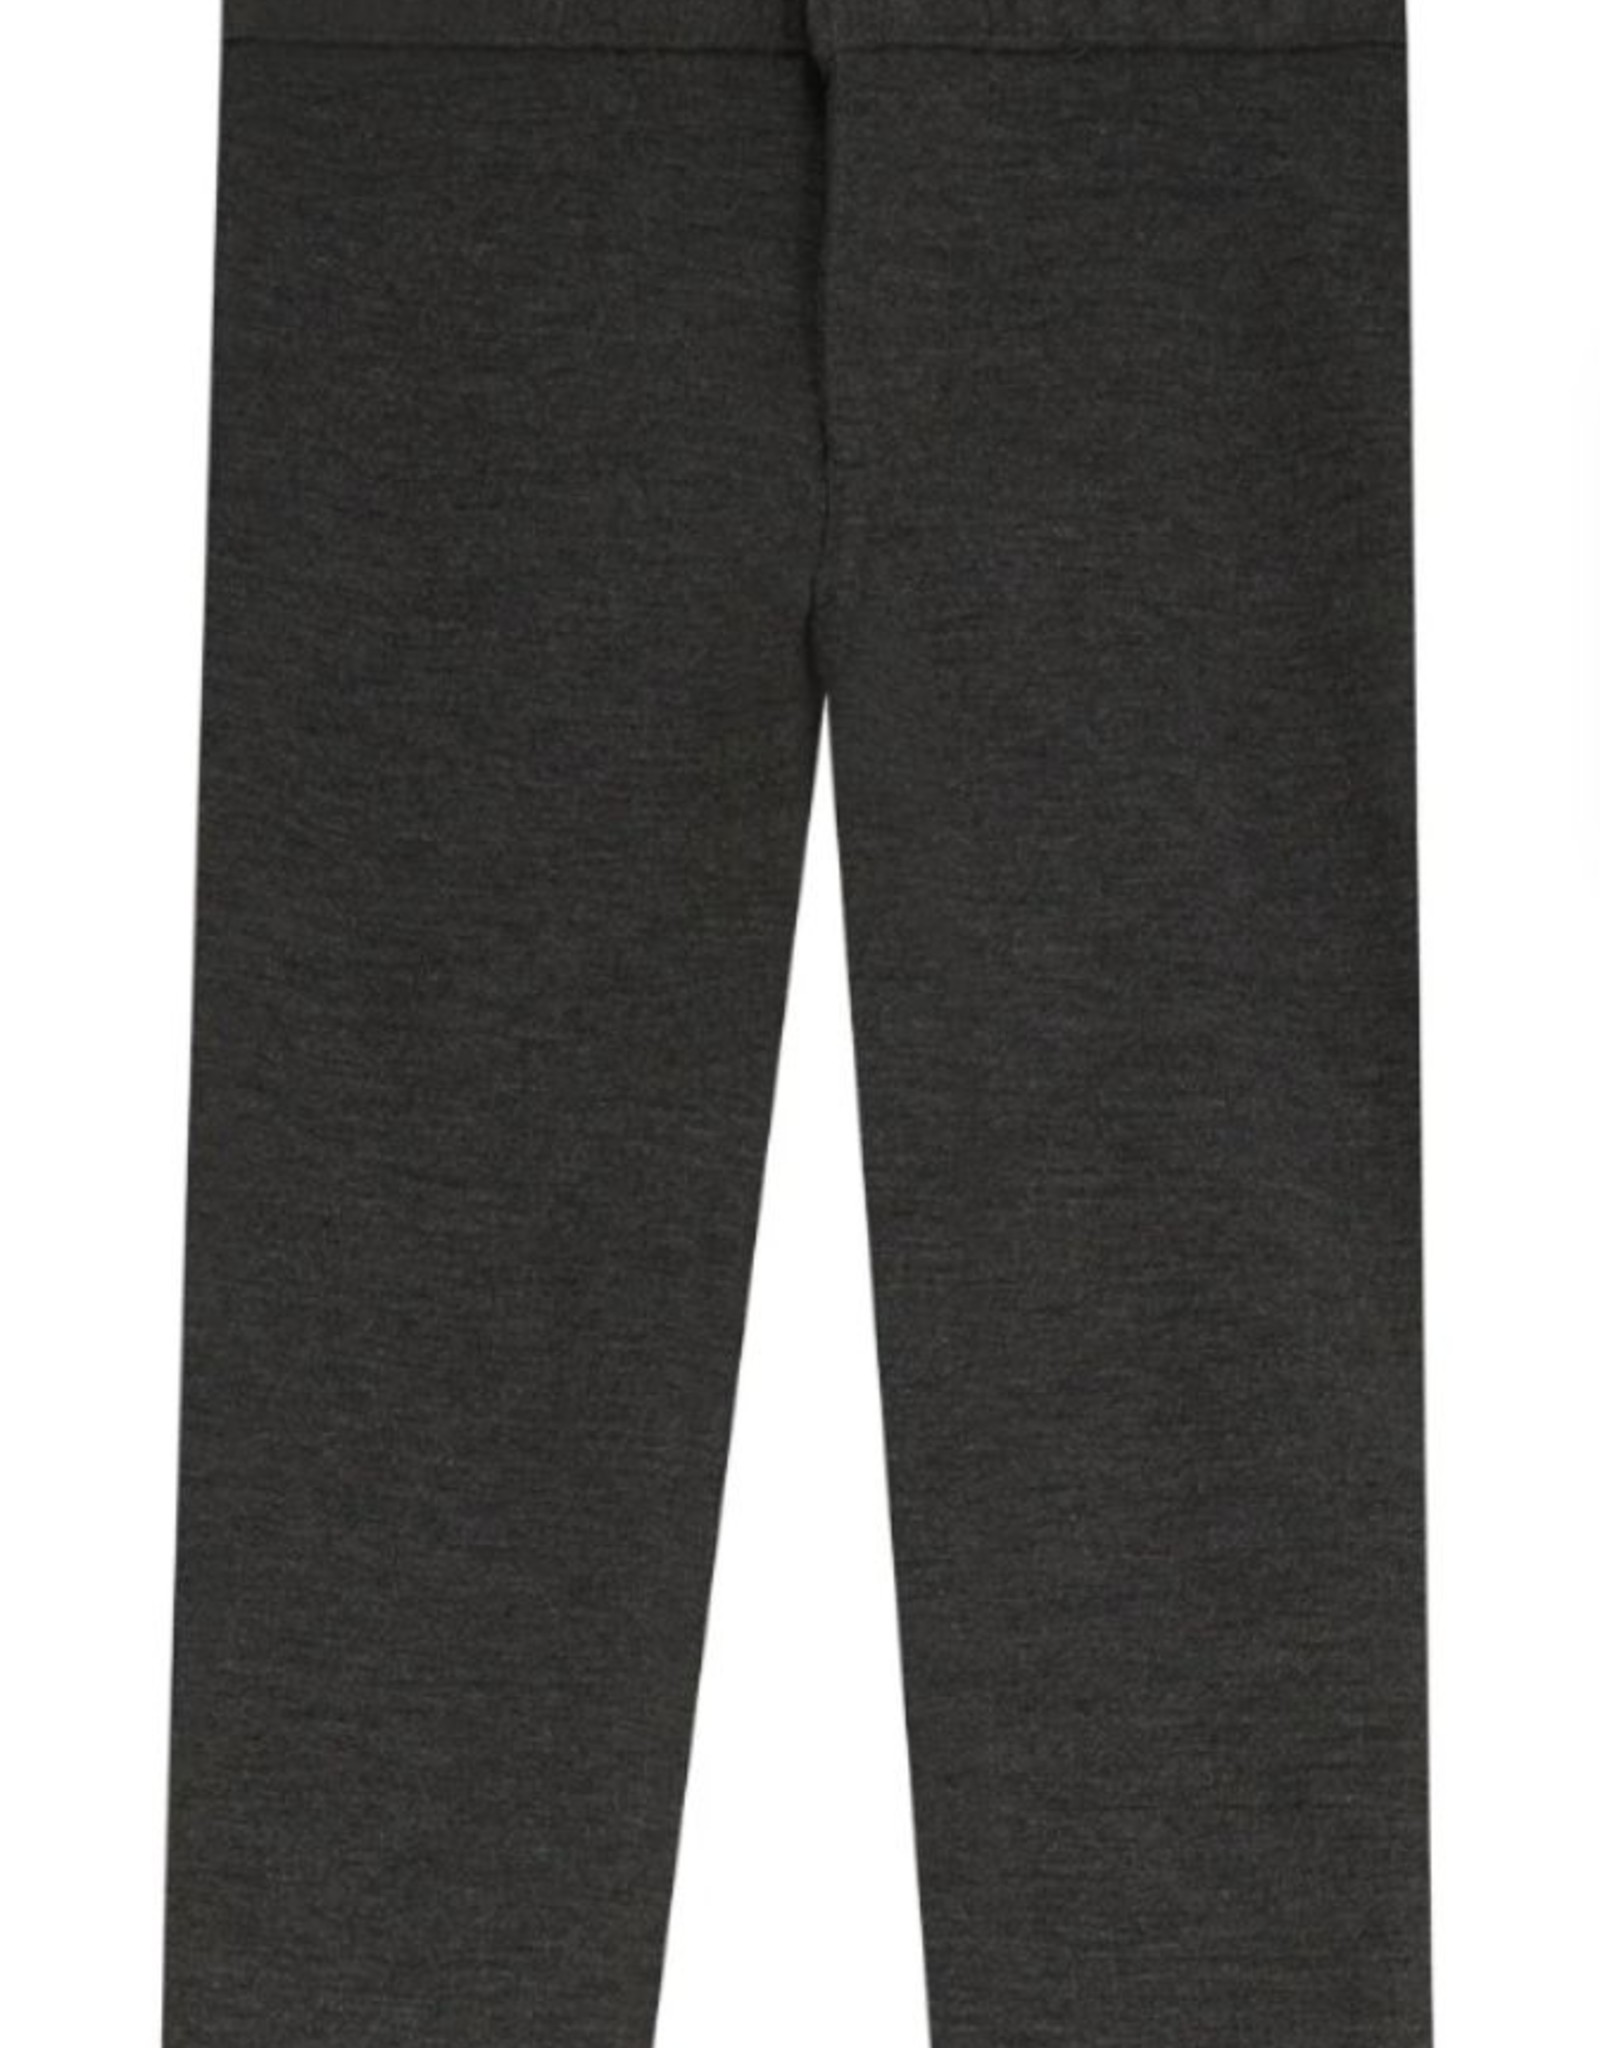 Mocha Noir Mocha Noir Ponte Skinny Fit Pants